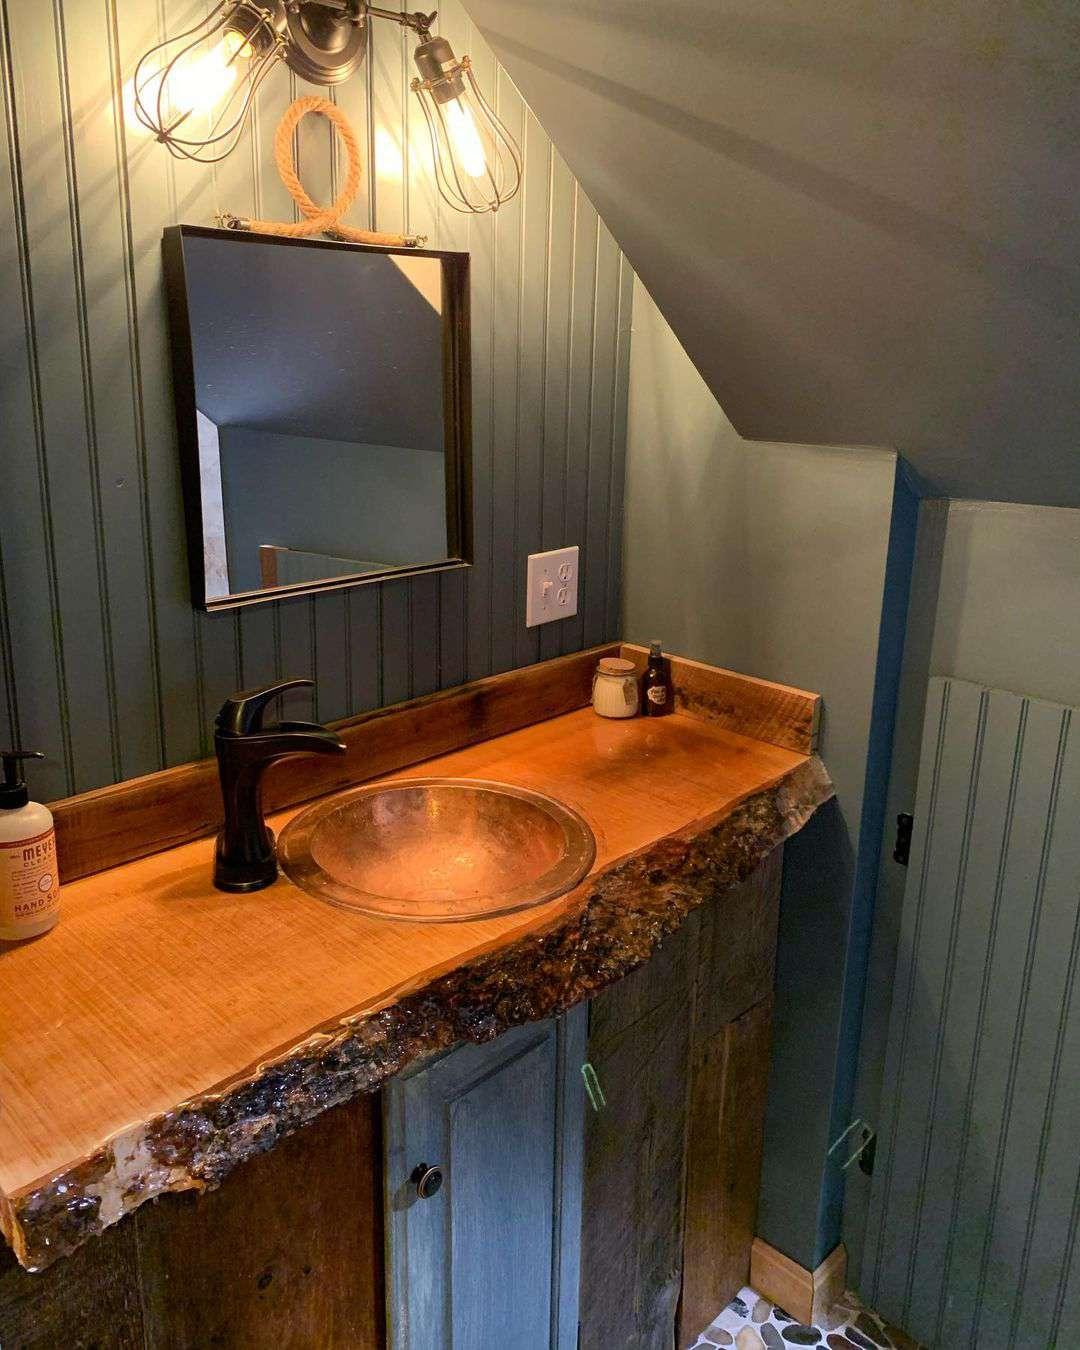 Bathroom with green walls and wood vanity